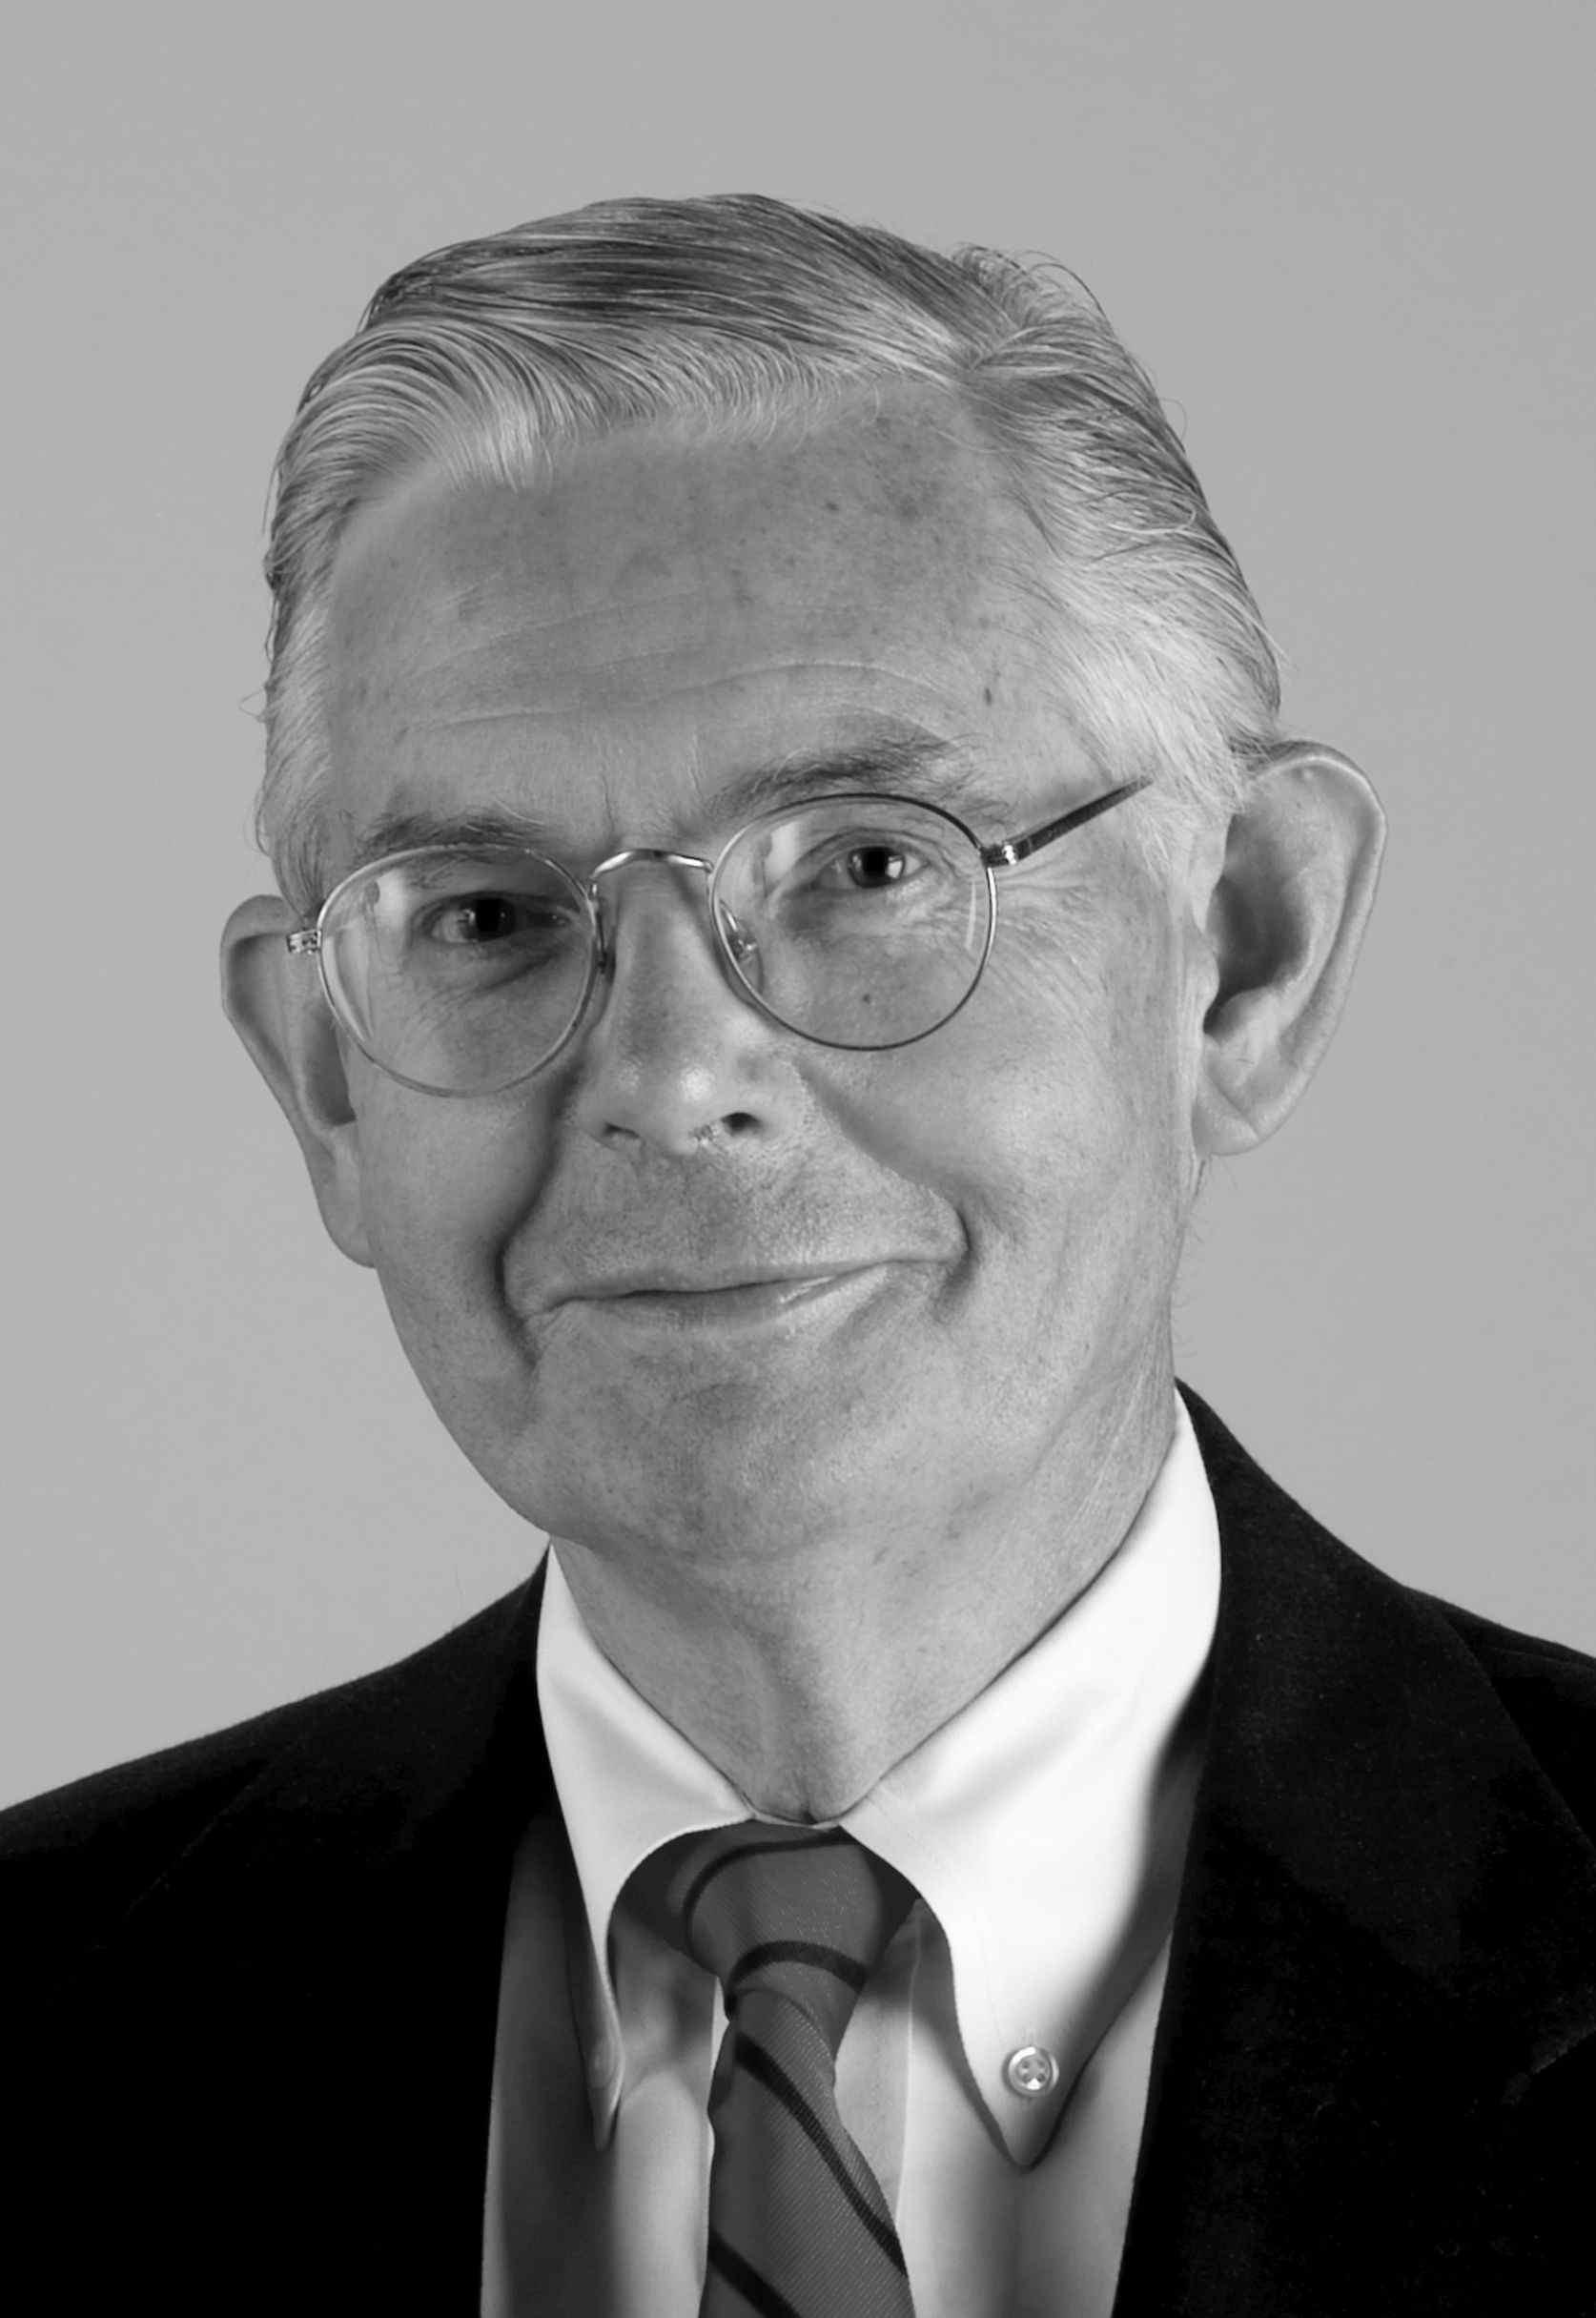 Robert B. Currey